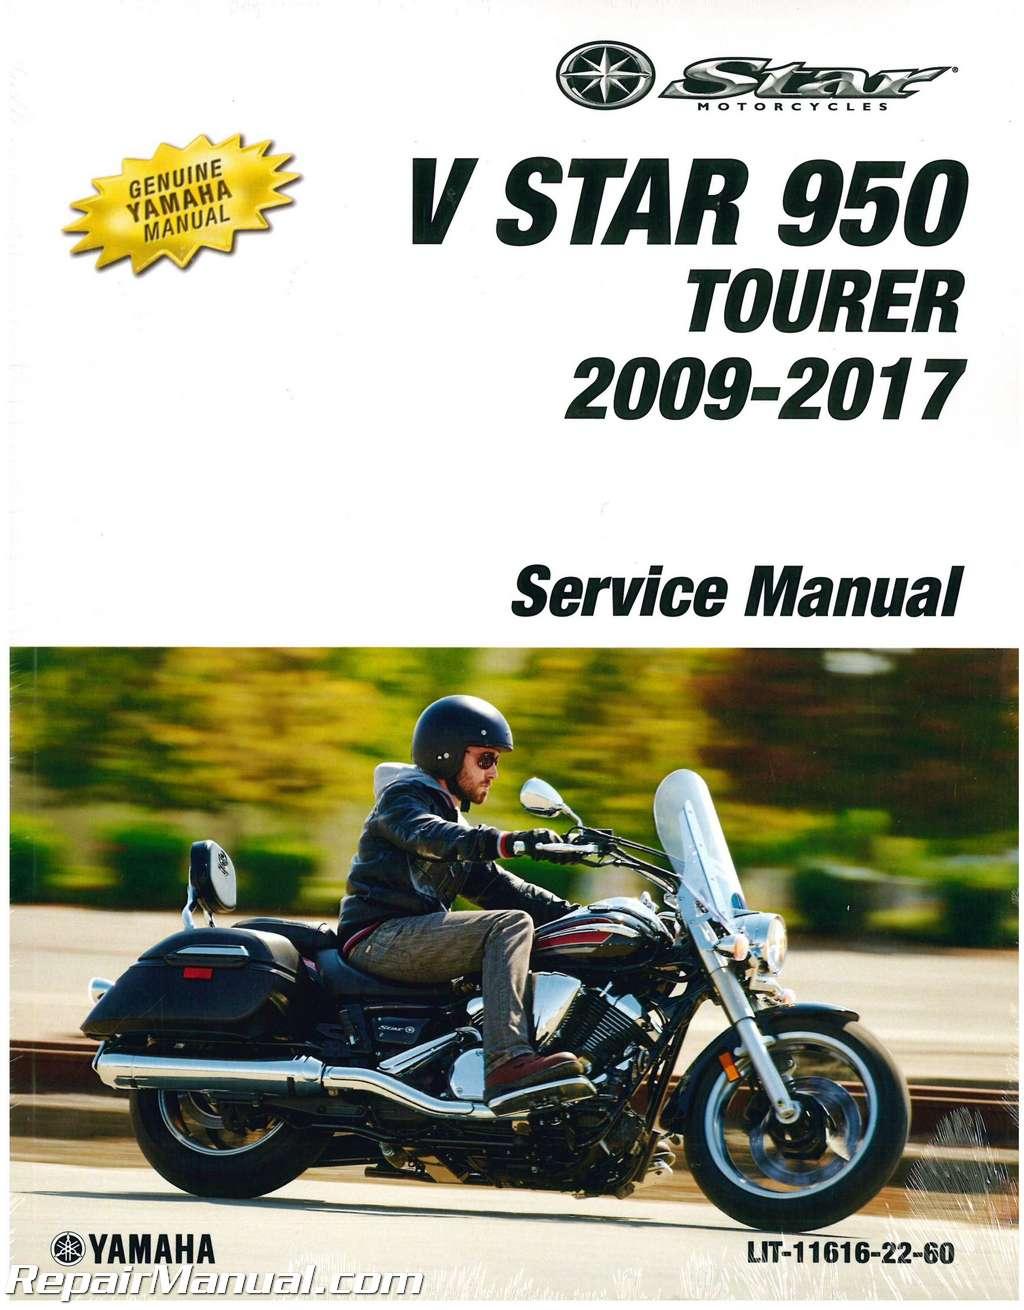 2009 2017 yamaha xvs950 v star motorcycle service manual rh repairmanual com yamaha v star 1100 manual pdf yamaha v star 650 manual